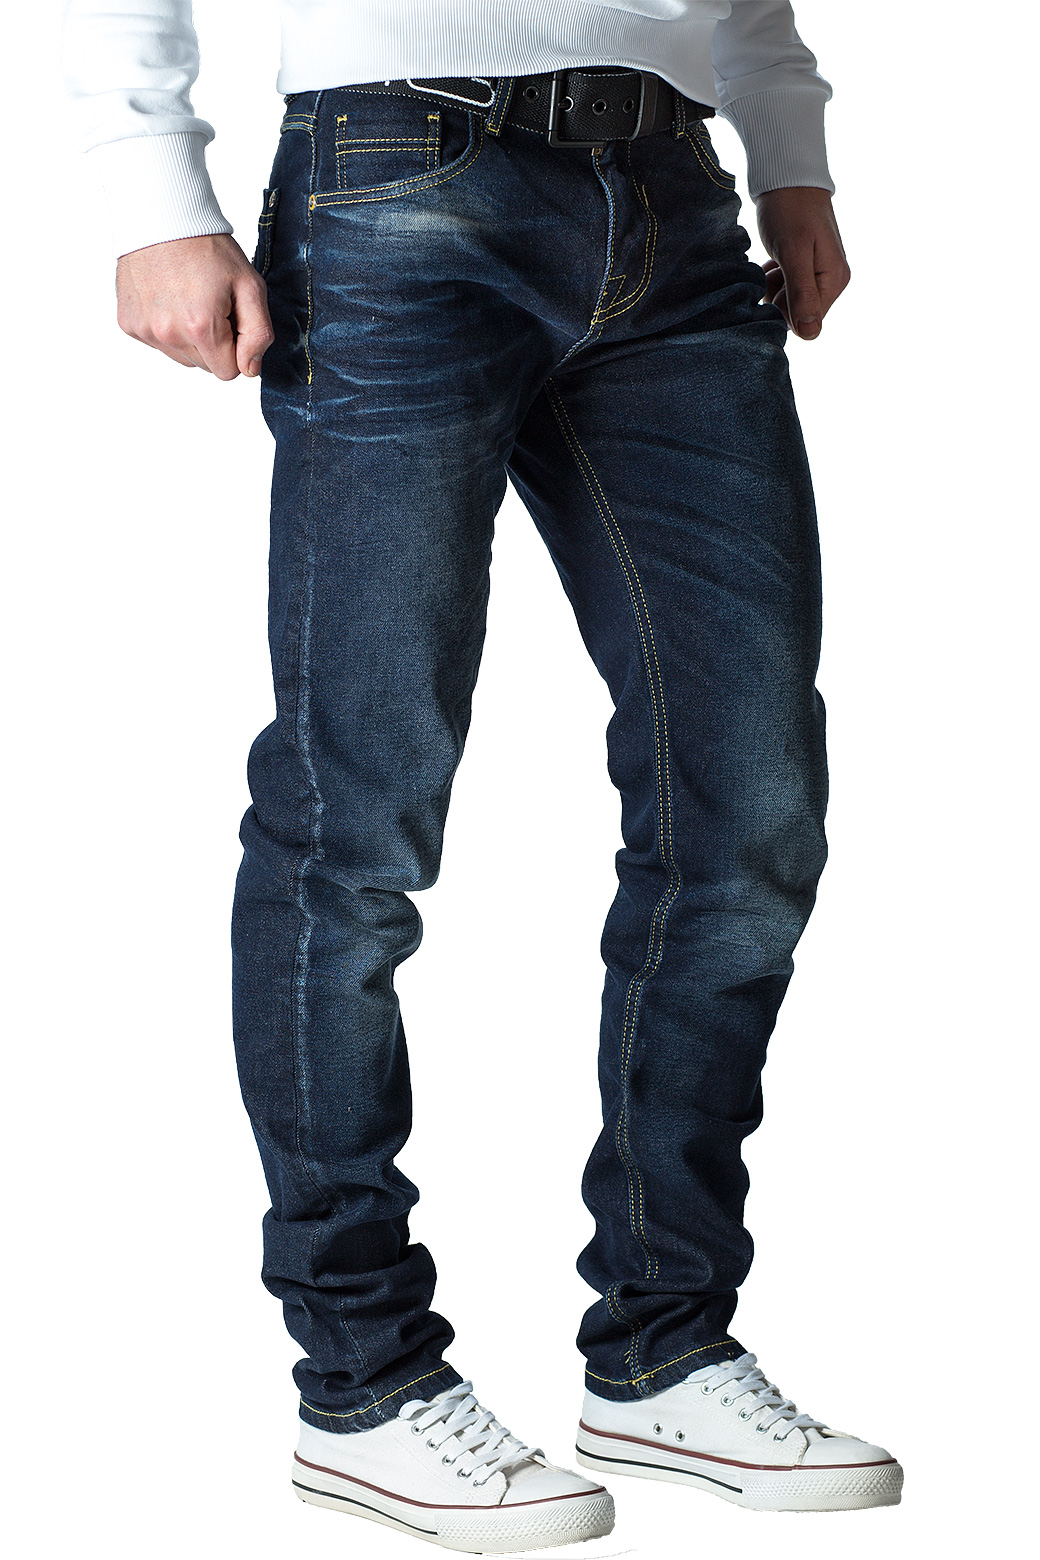 Cipo-amp-Baxx-Uomo-Jeans-Pantaloni-ricamate-Biker-Style-streetwear-nervature-pattern-Dope miniatura 32